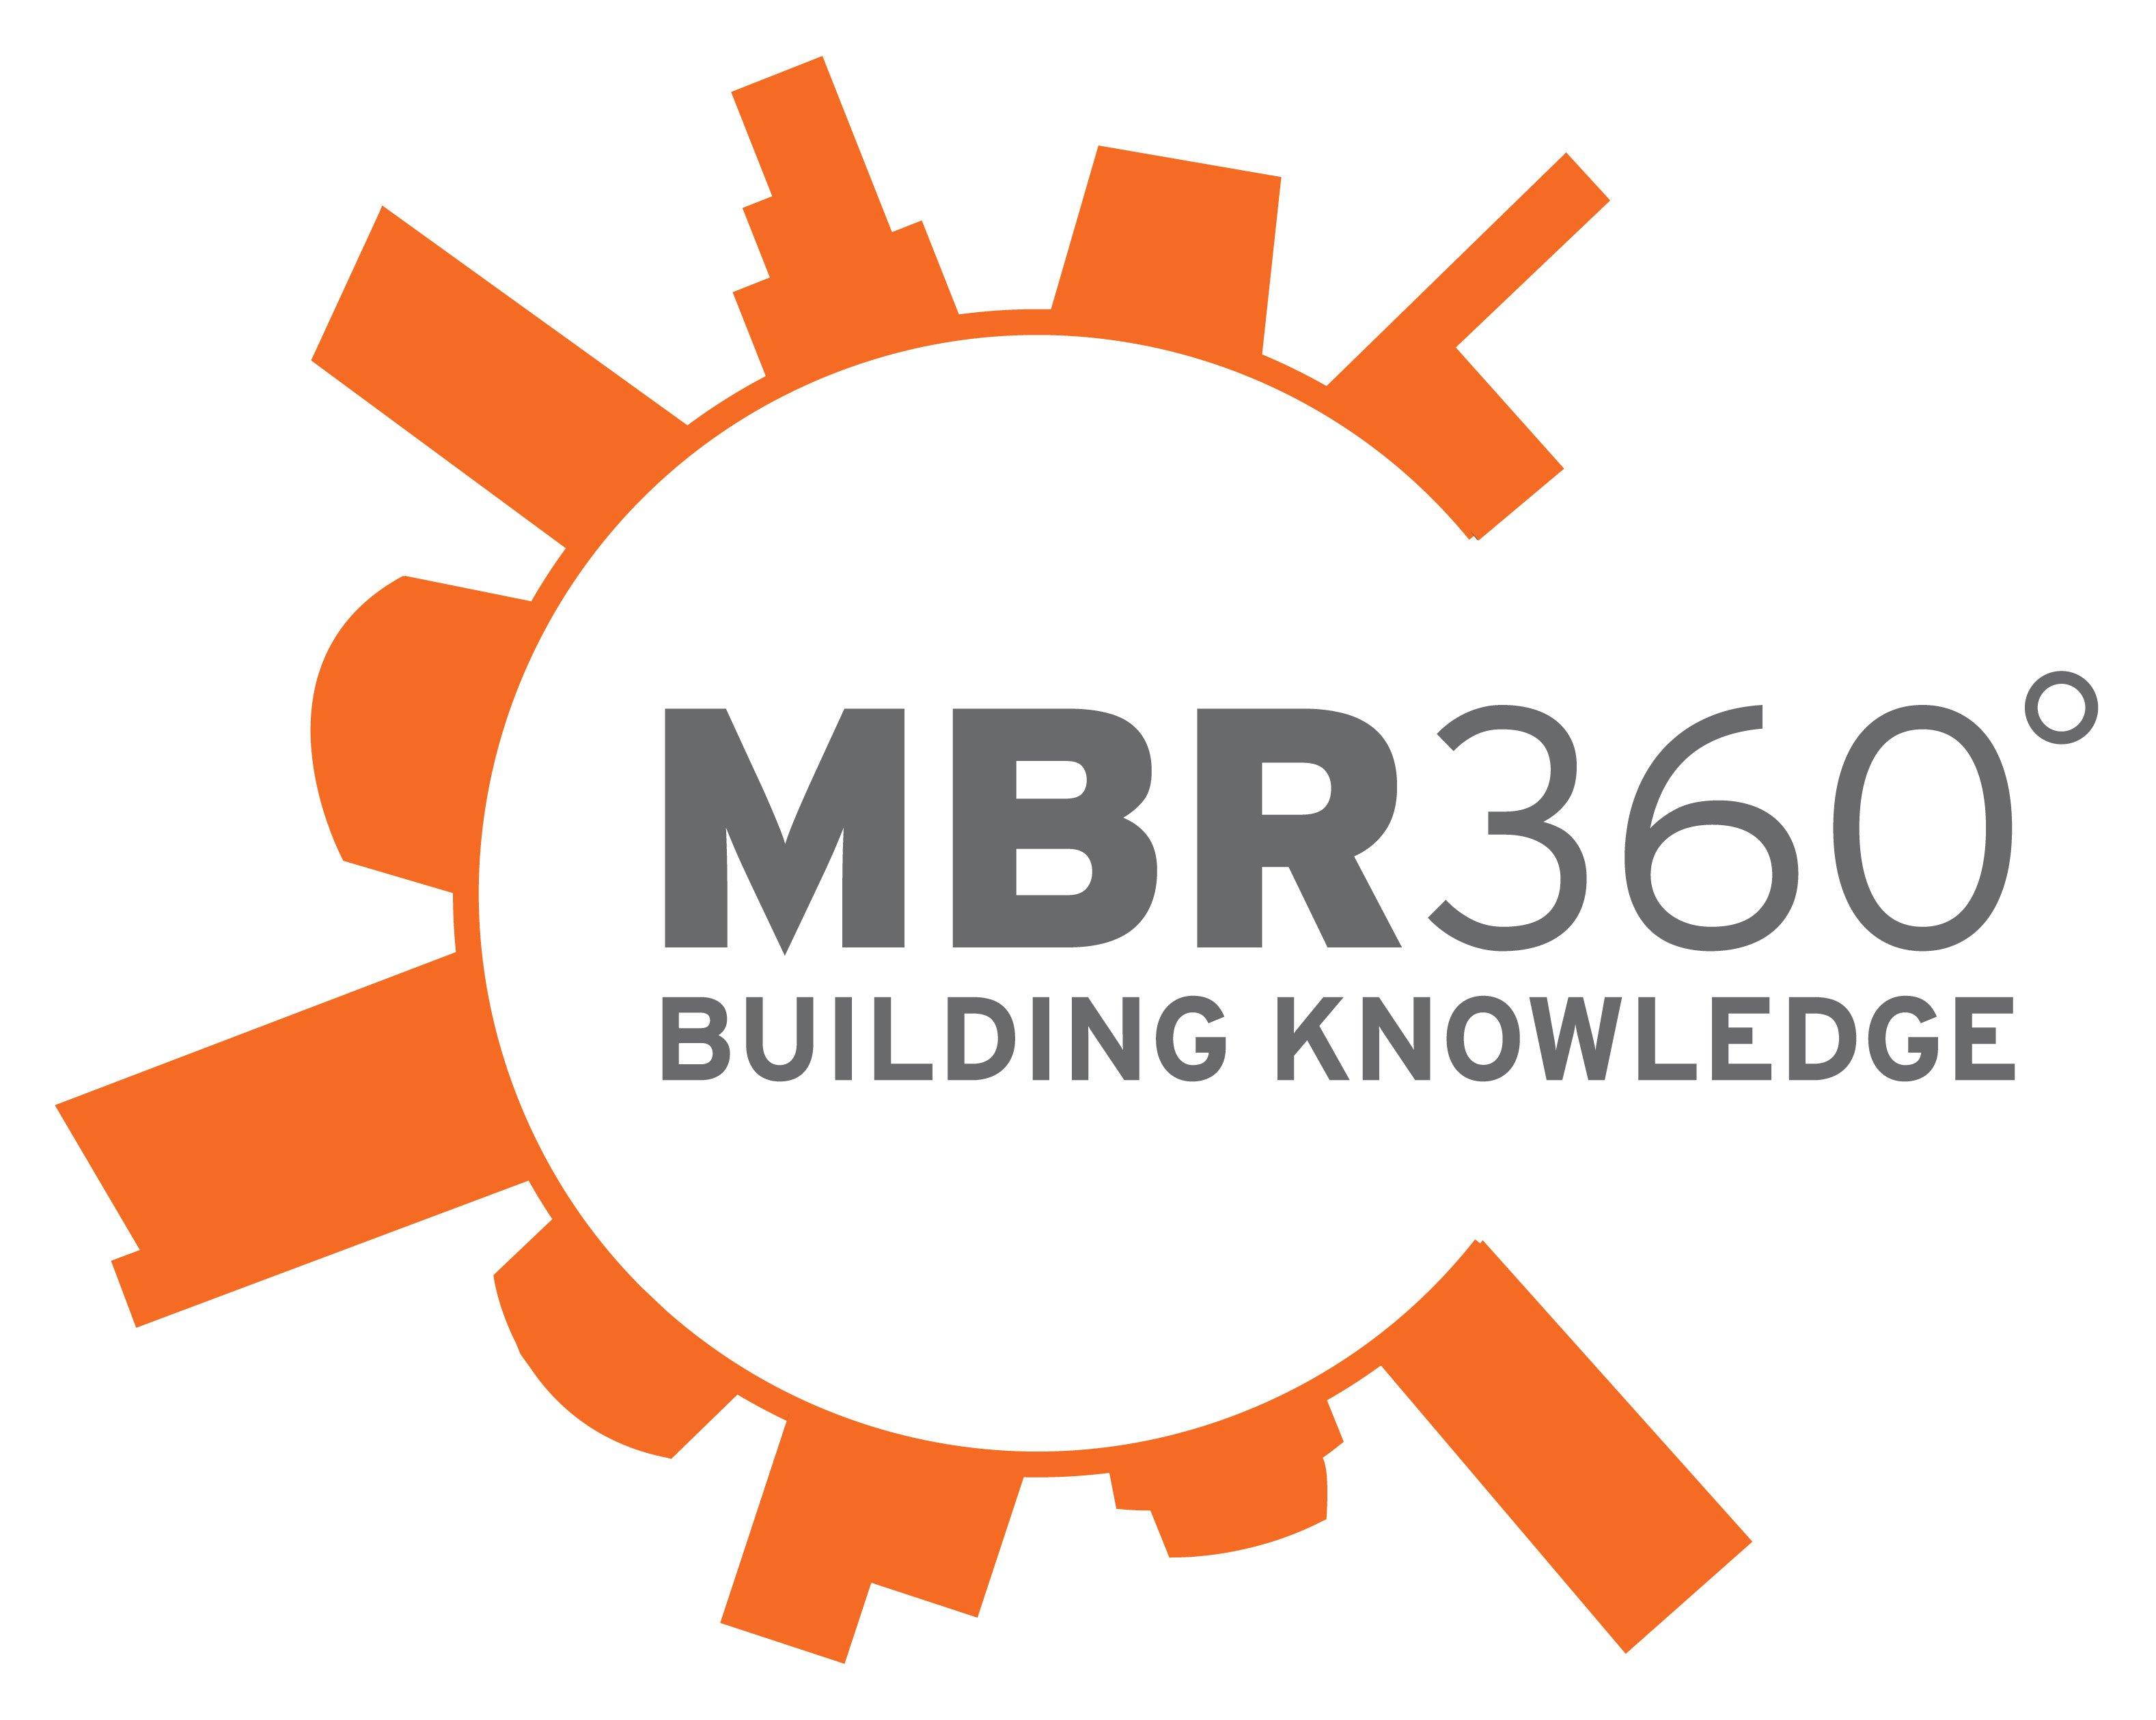 Mbr360